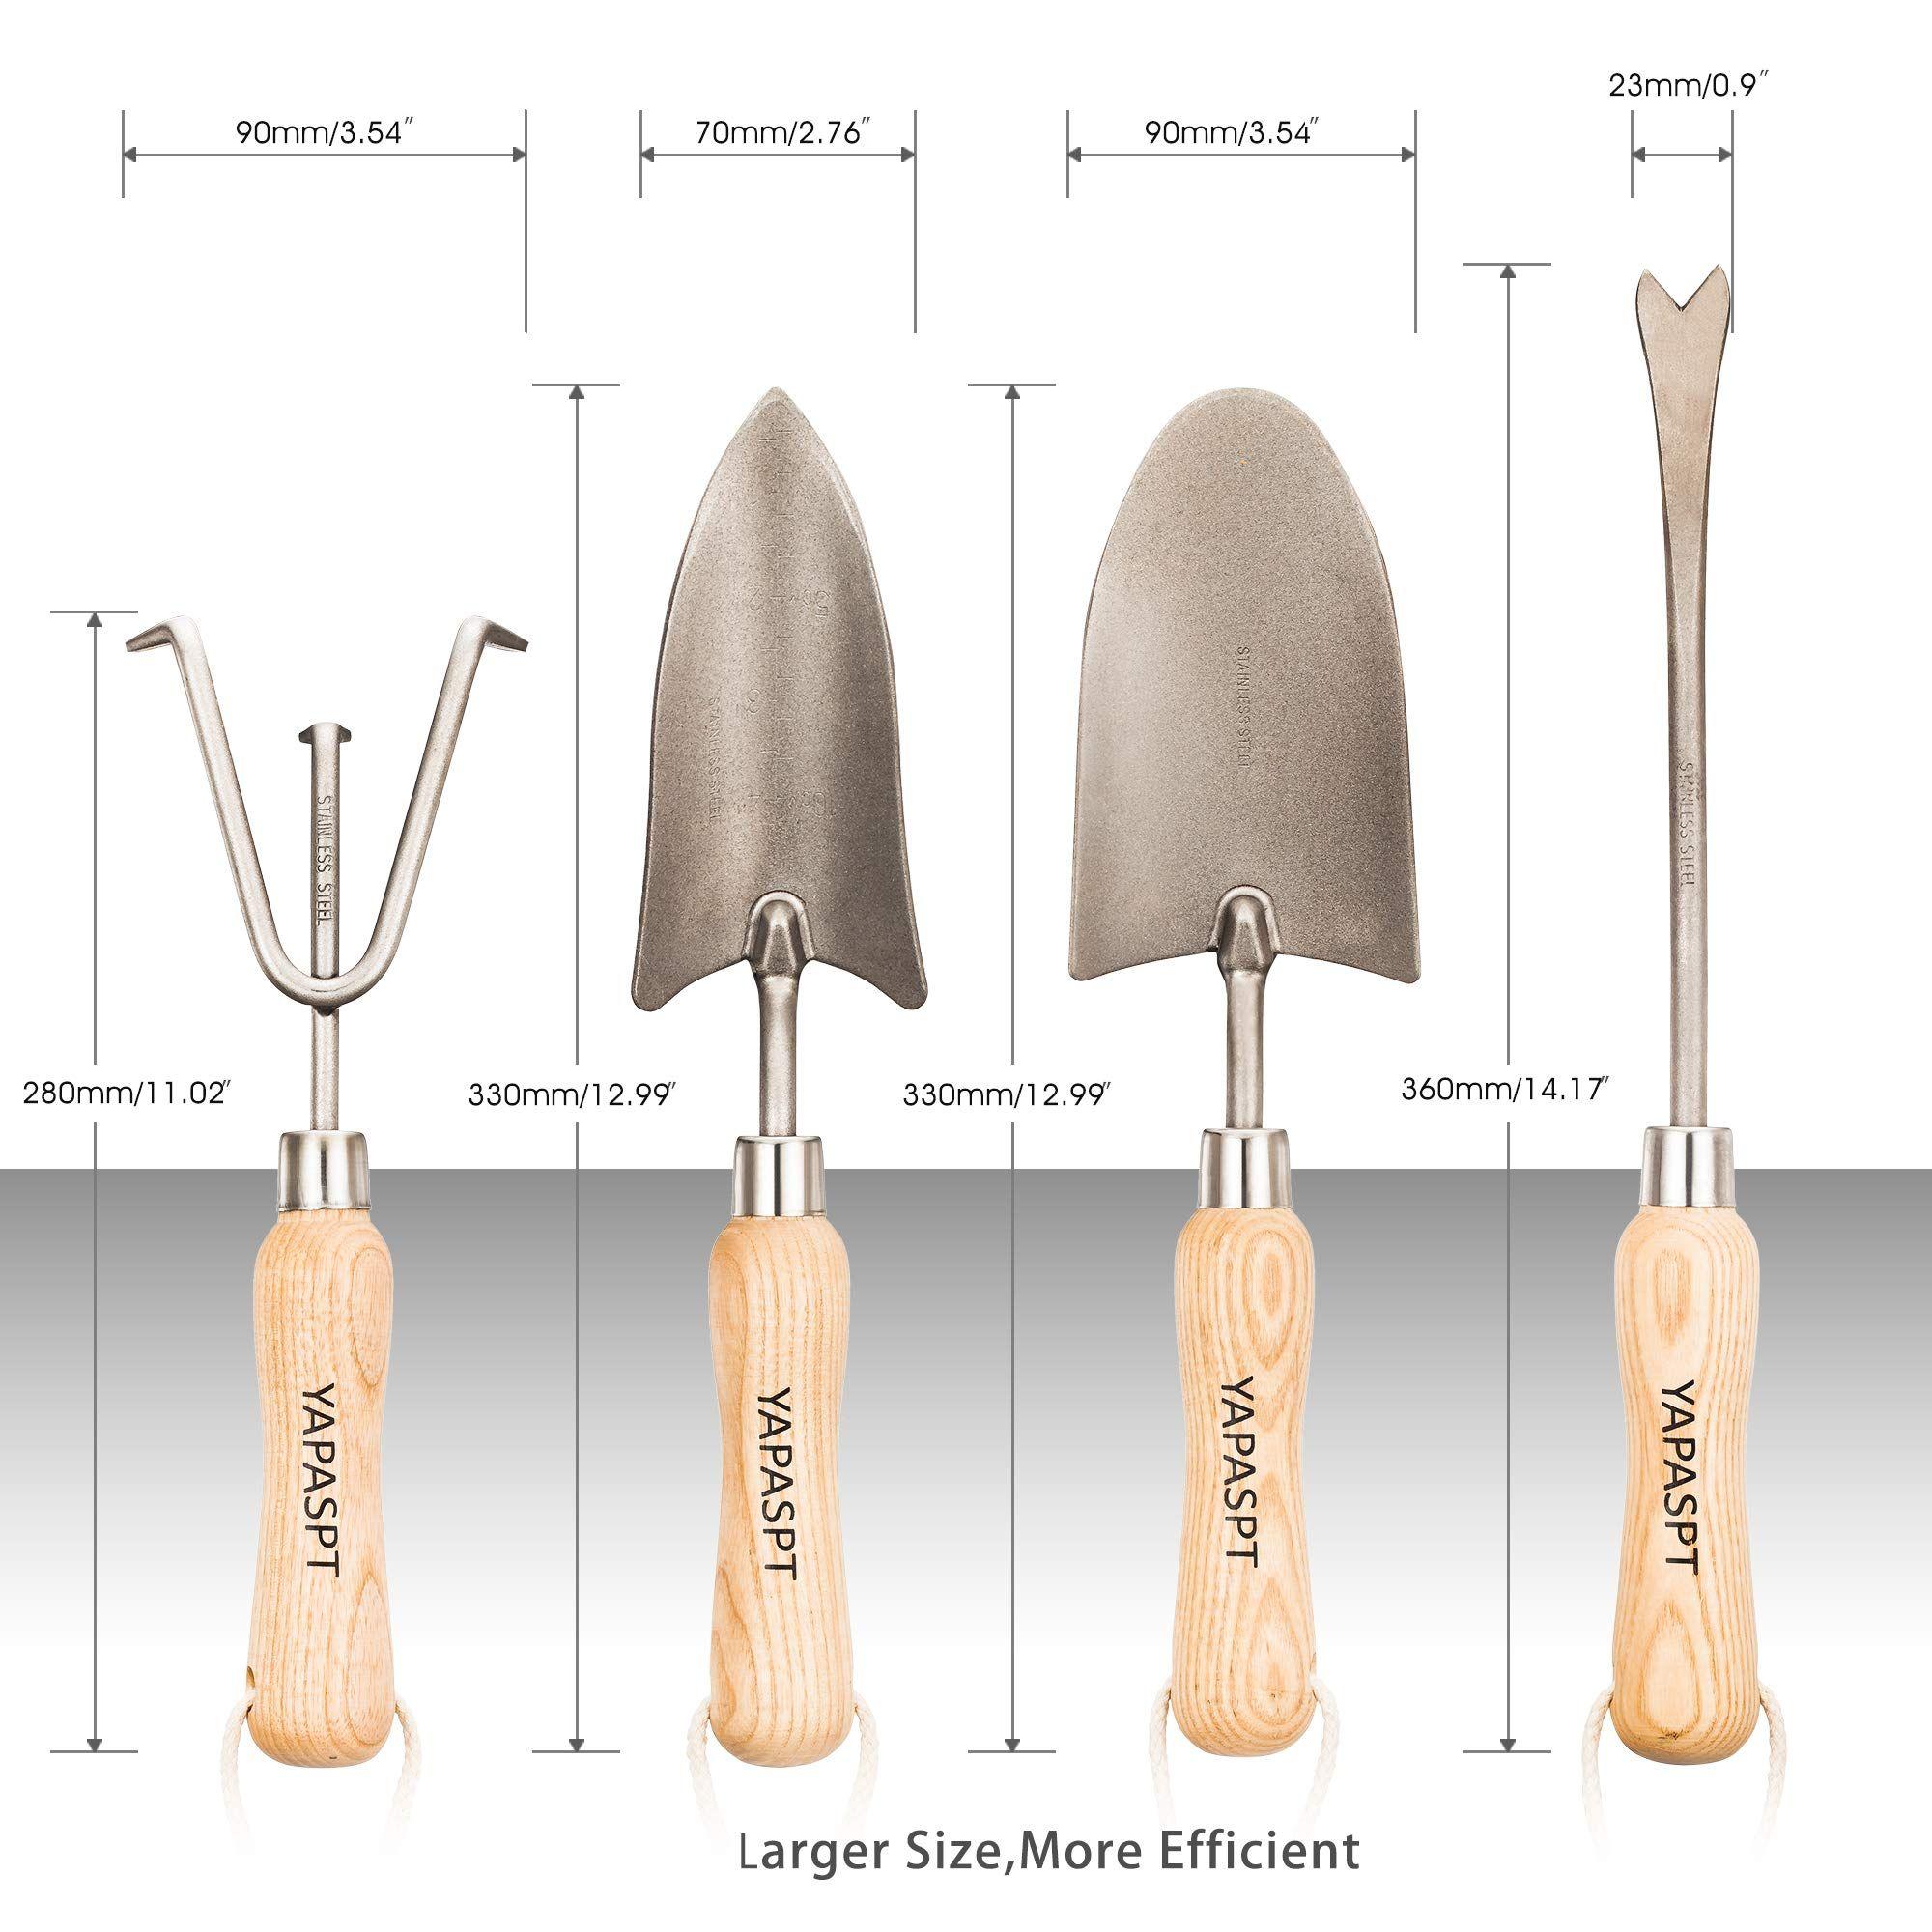 Yapaspt Gardening Tools 4 Piece Heavy Duty Garden Hand Kit